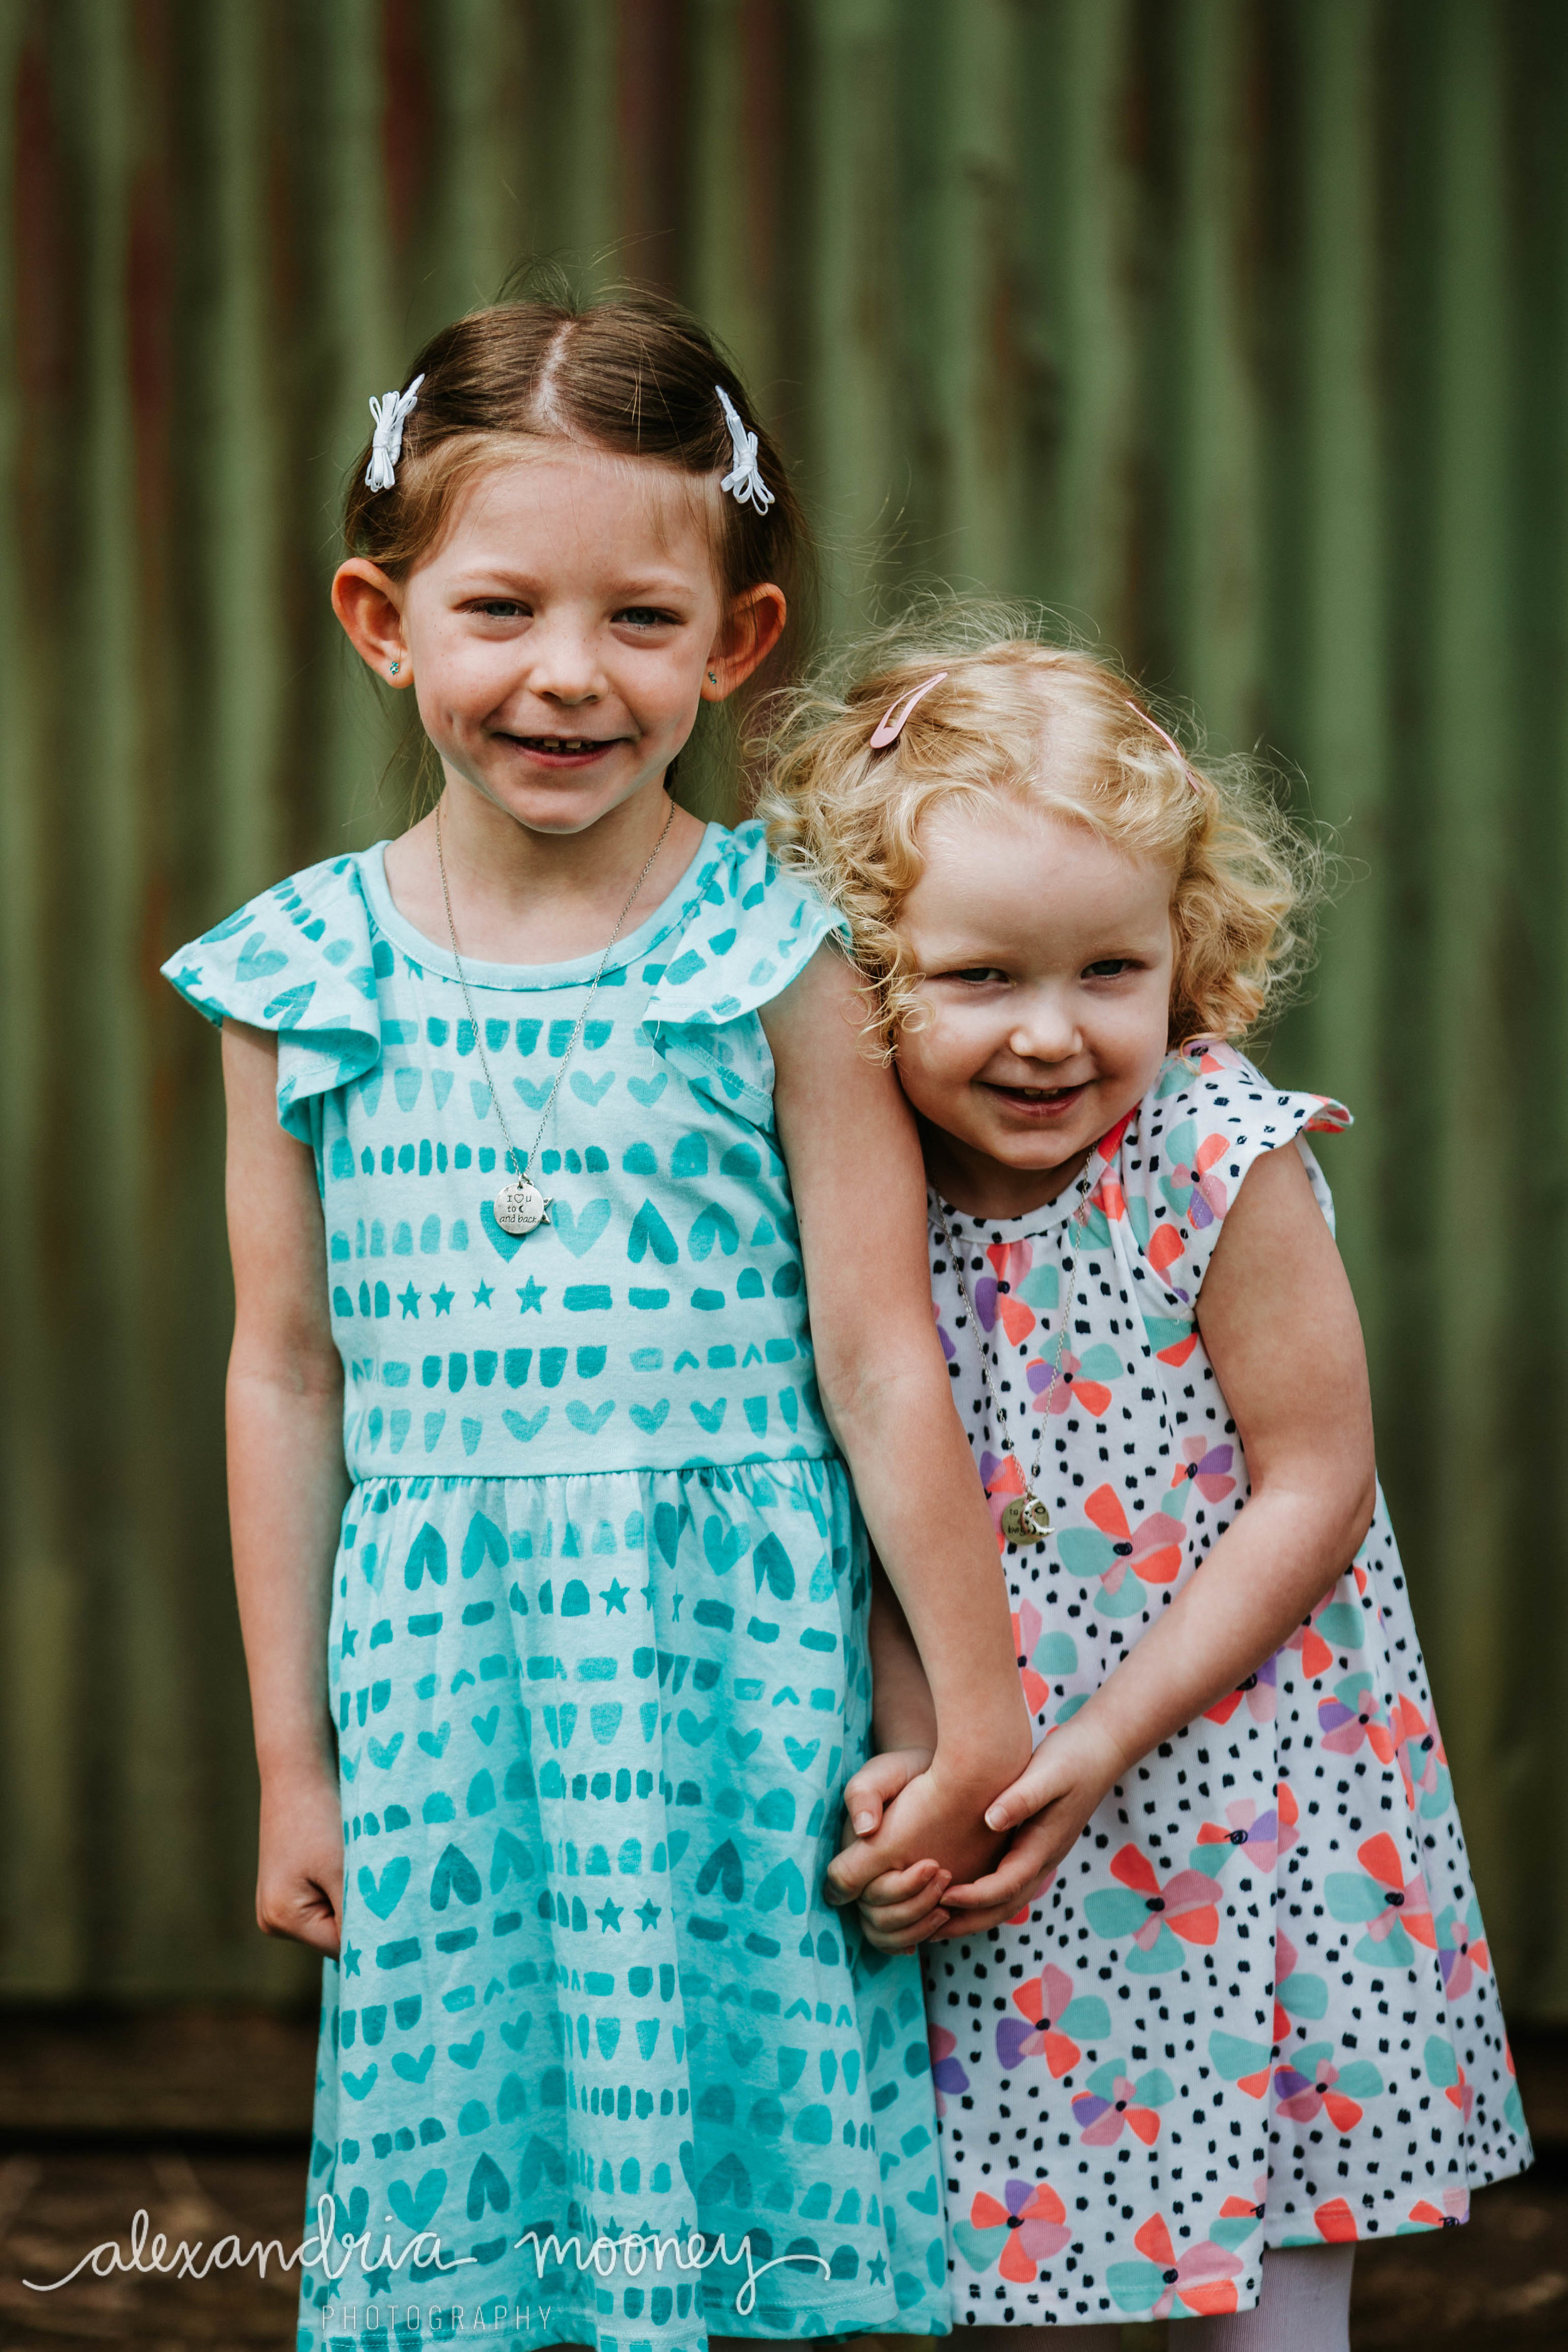 TheForbesGirls_Watermarked-12.jpg